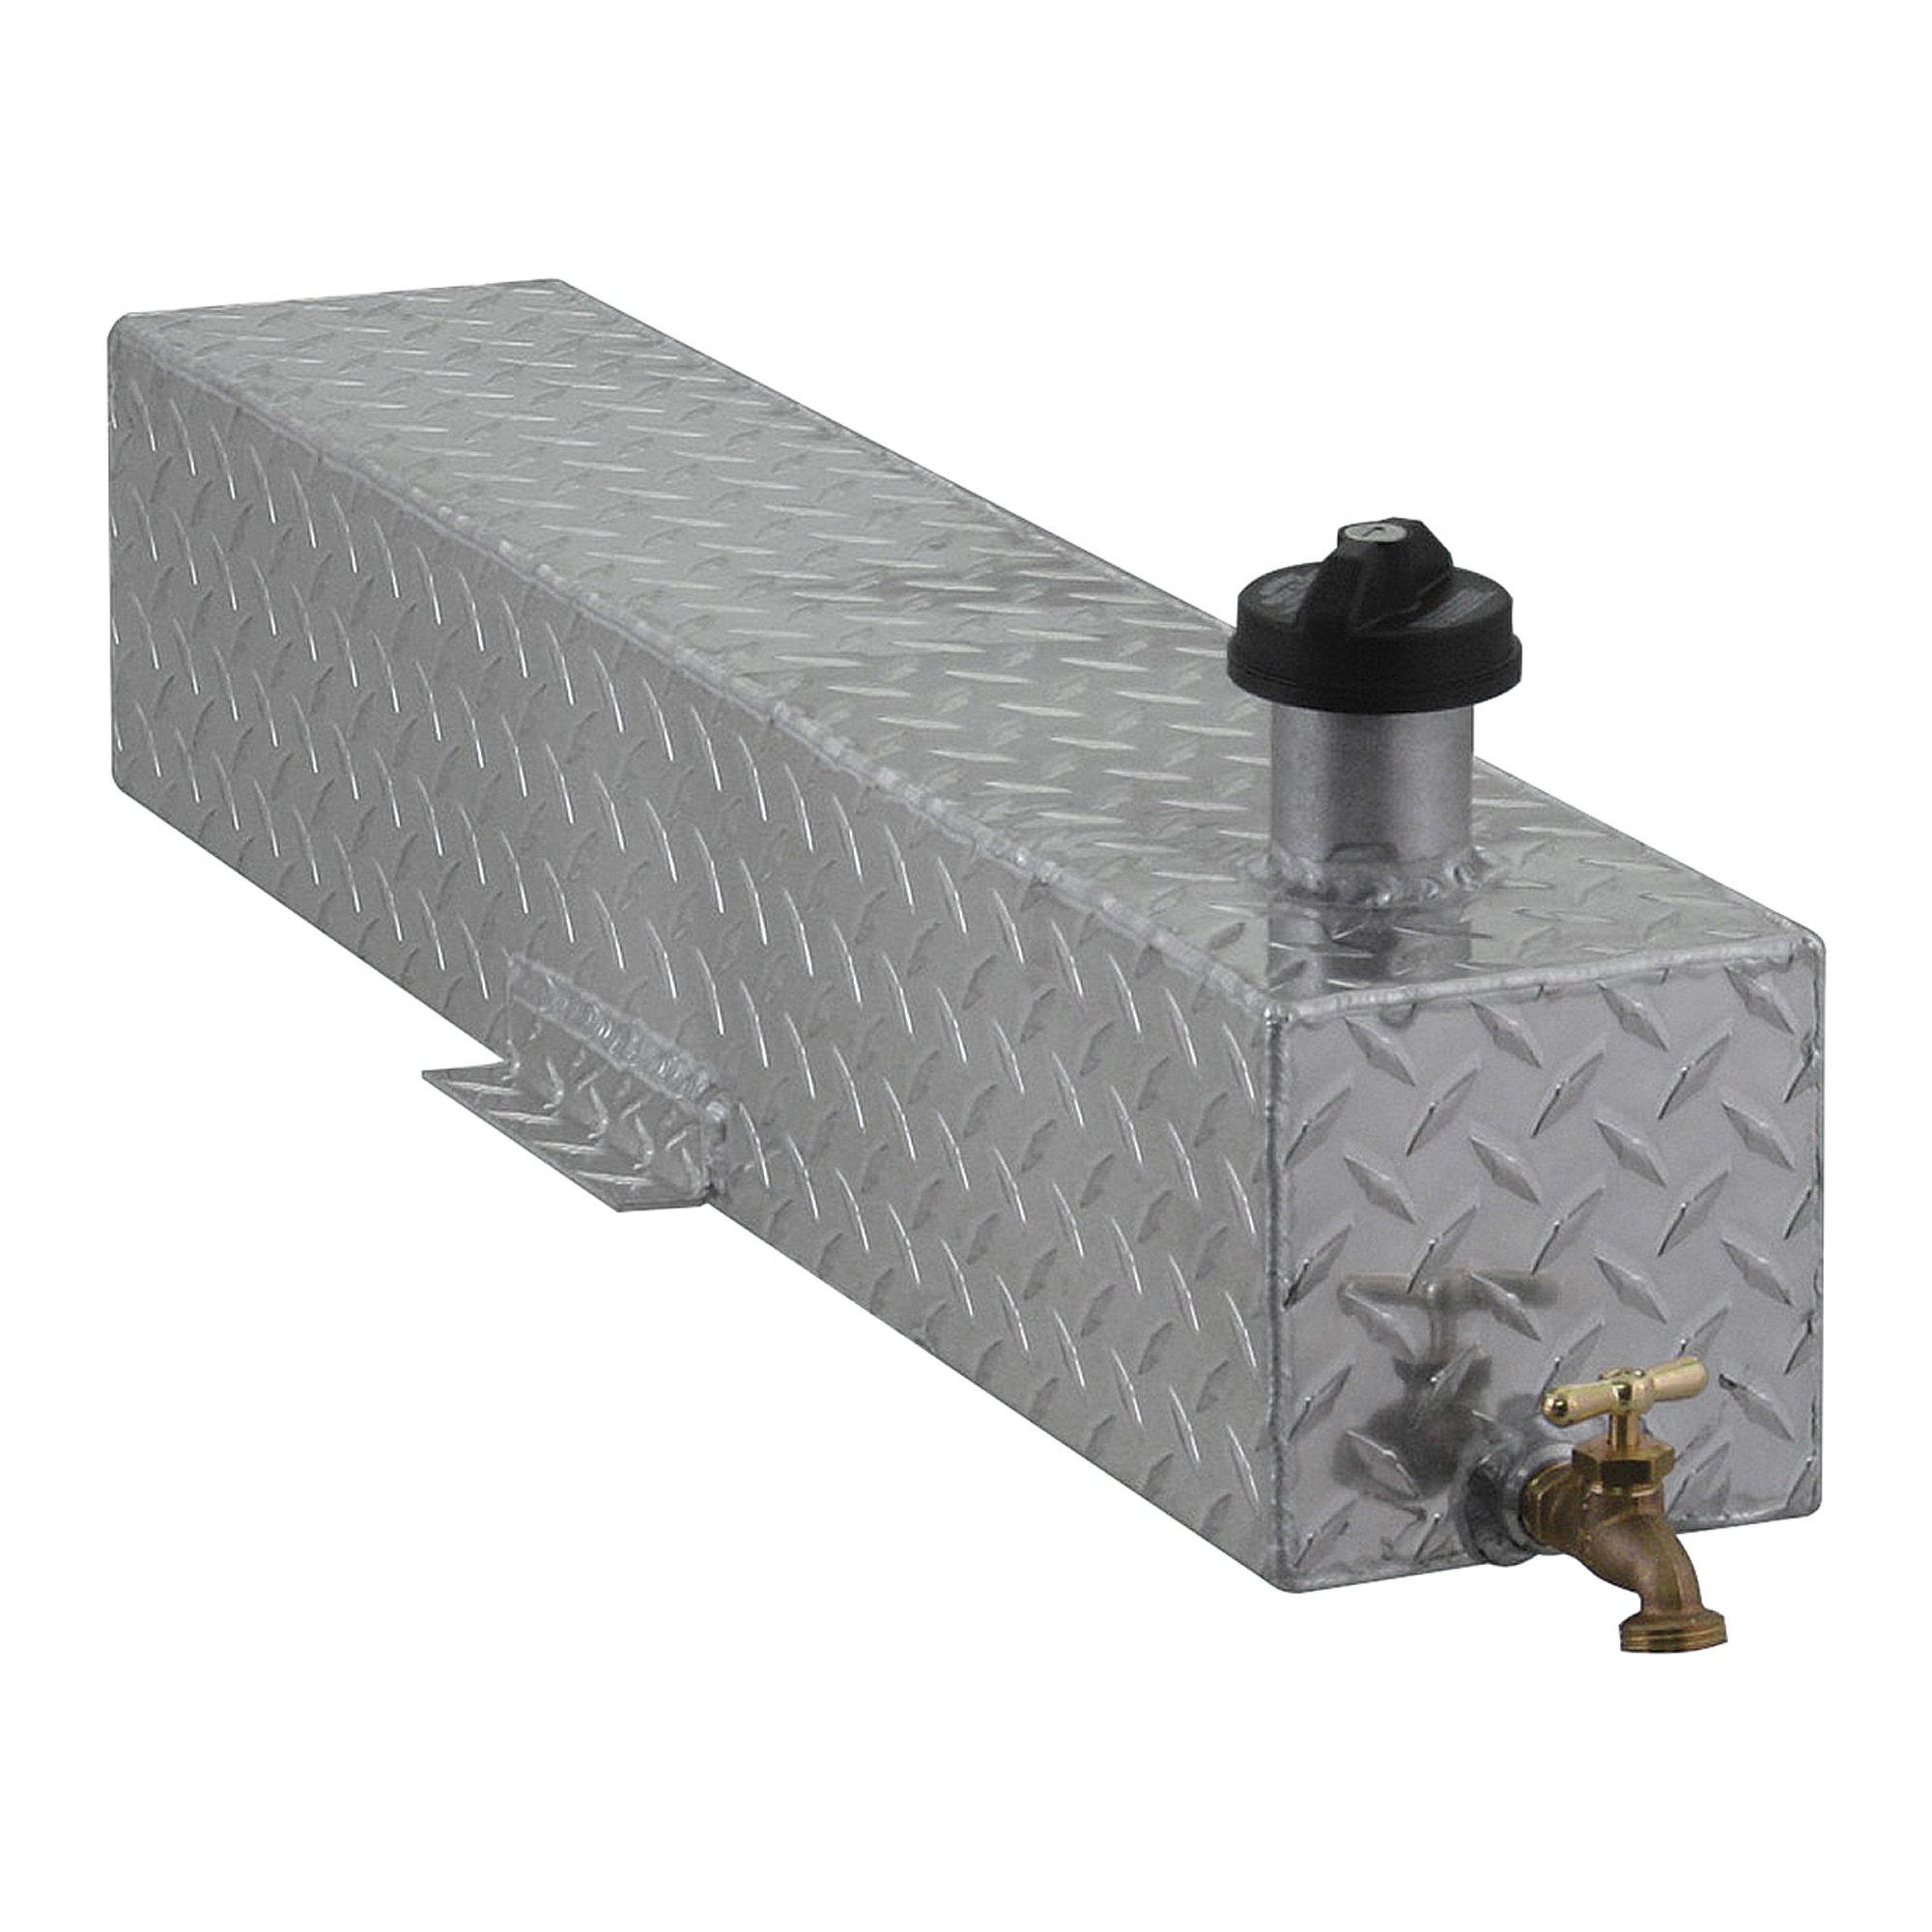 Diamond Plated 5-Gallon Aluminum Mounted Water Storage Tank